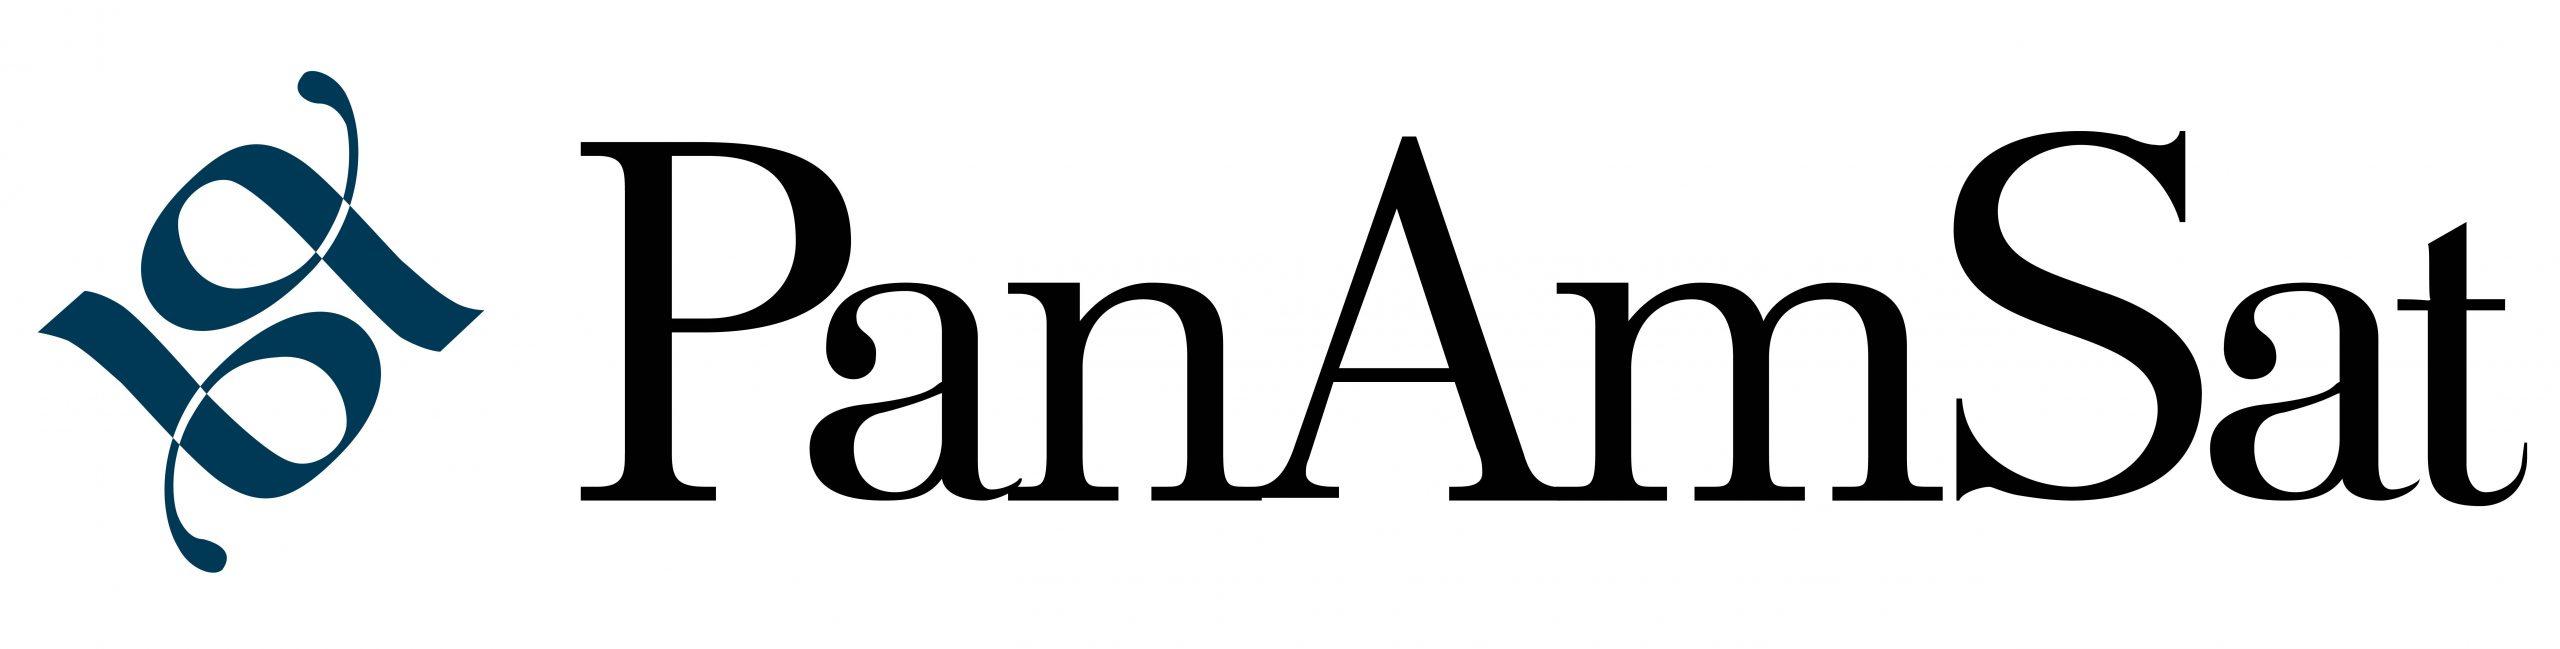 PanAmSat (Intelsat)